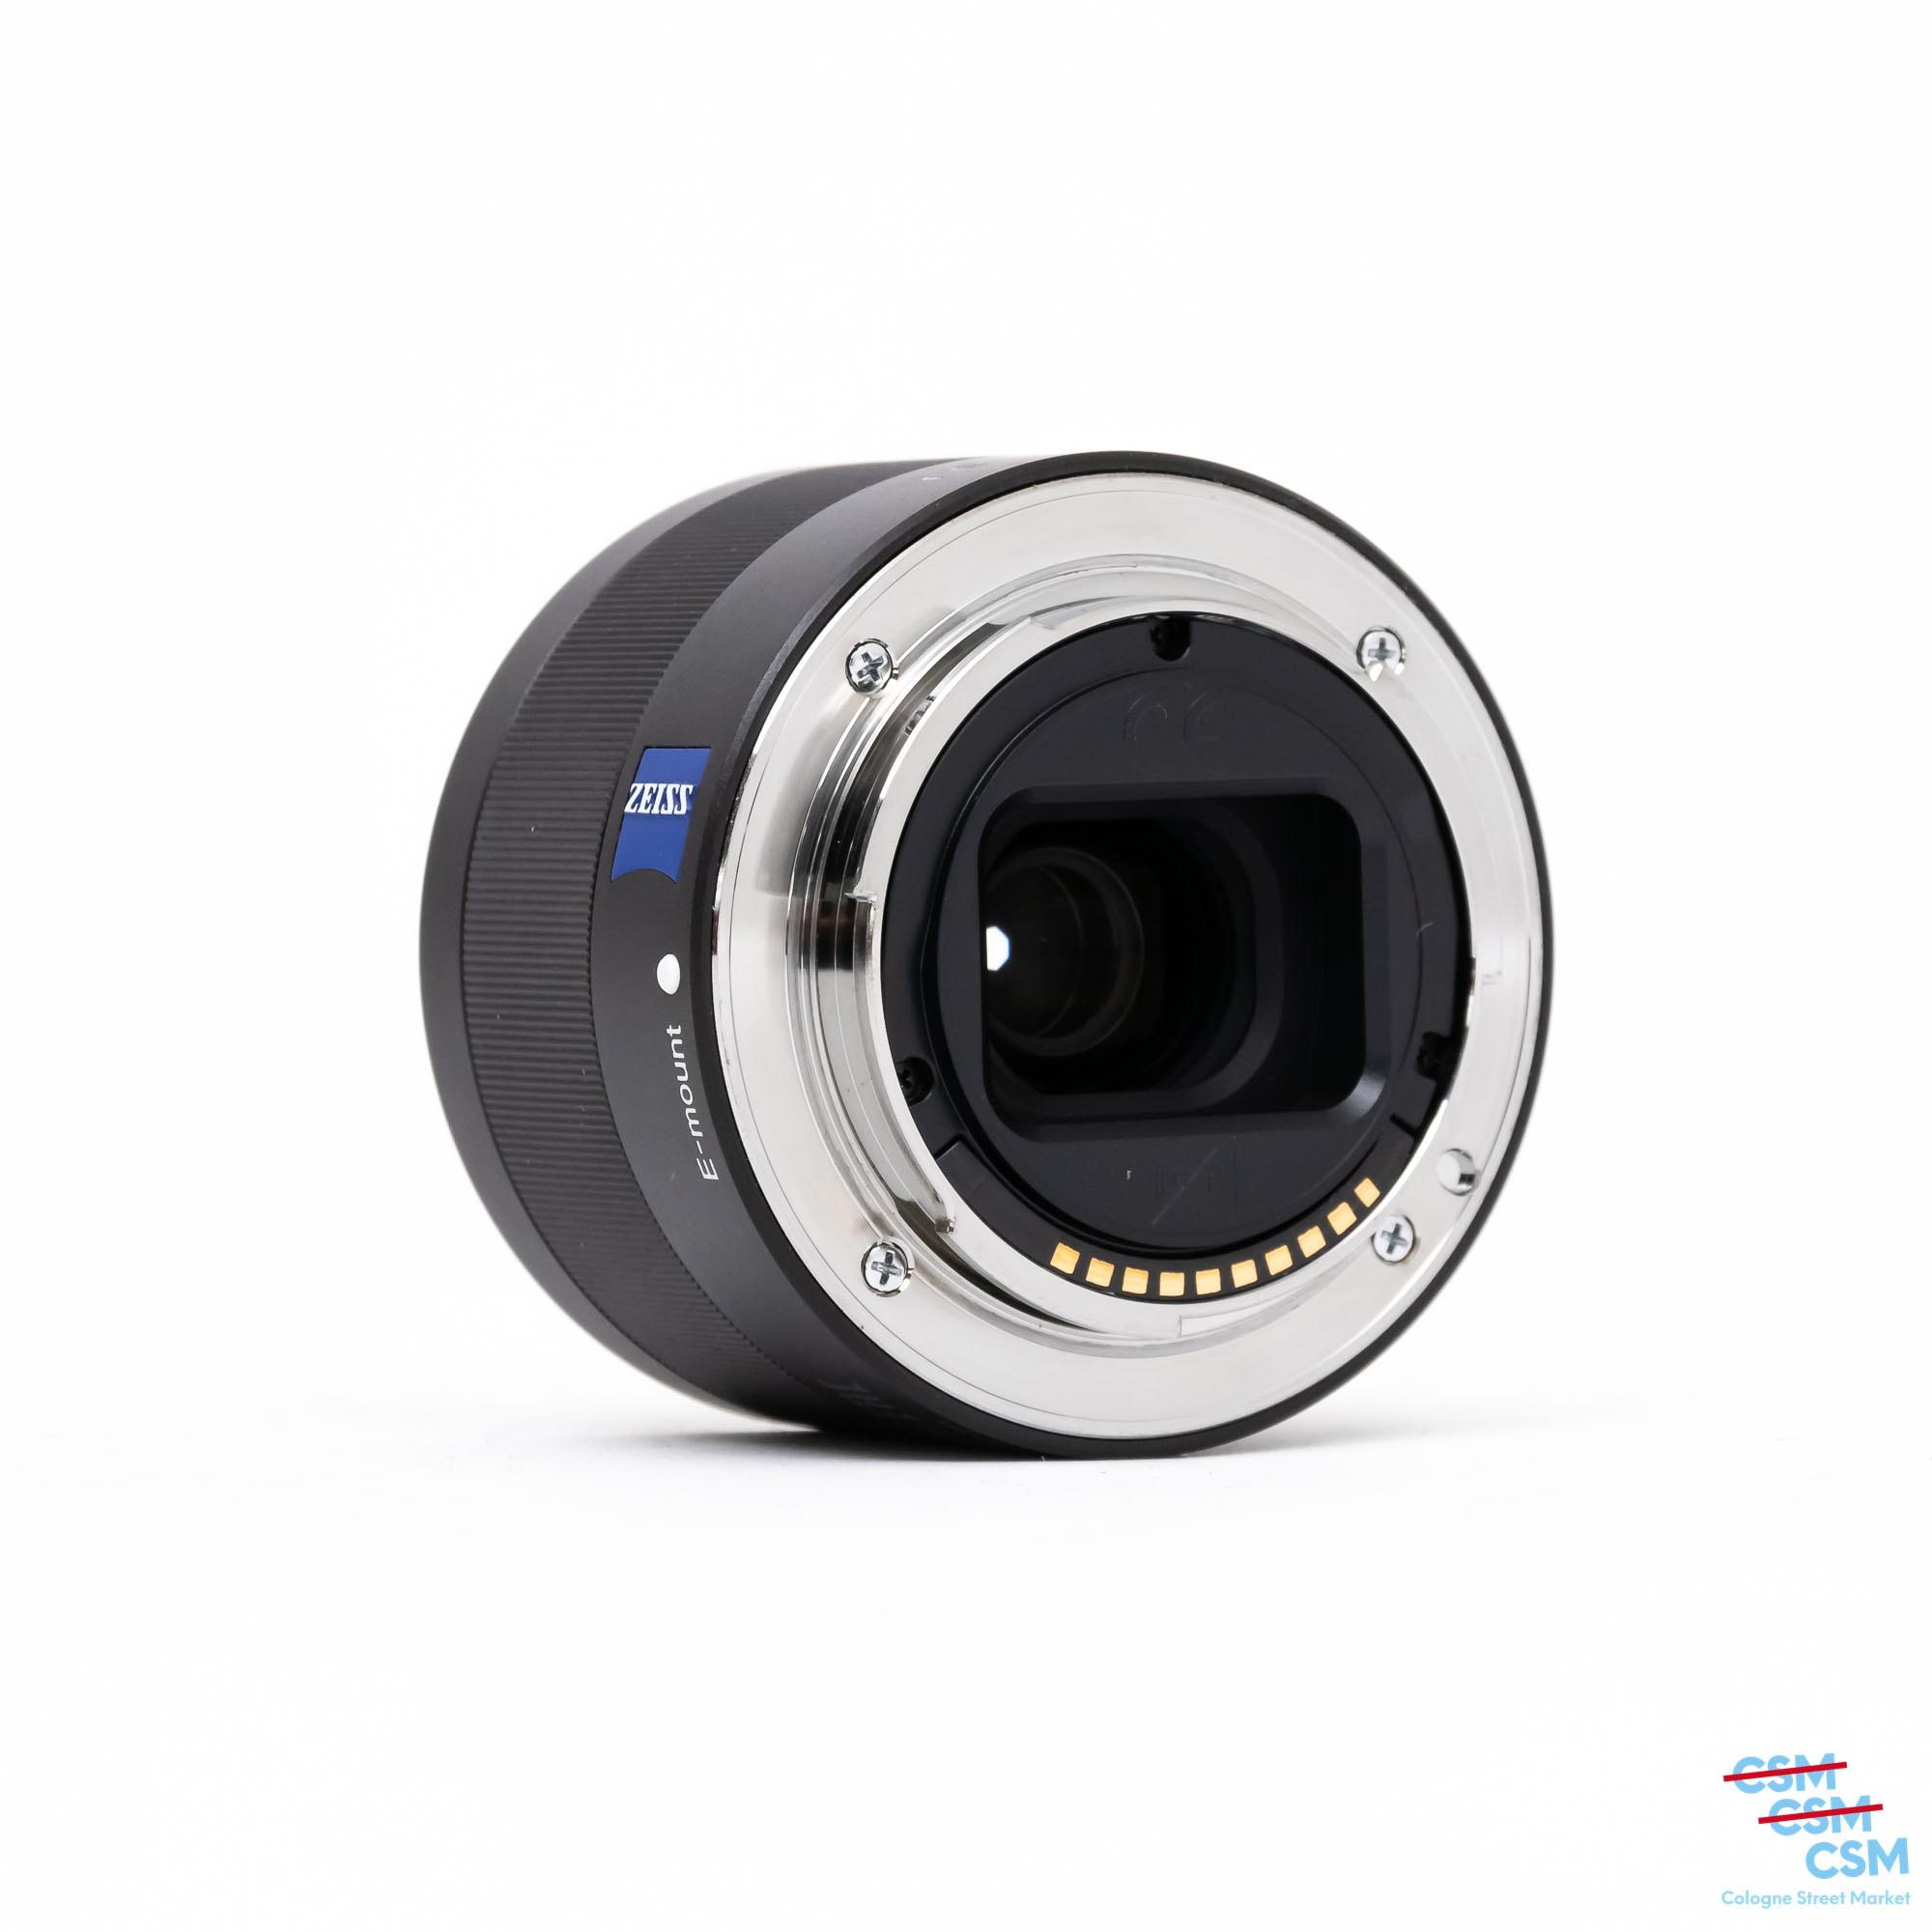 Sony-Sonnar-T-FE-35mm-f2.8-Zeiss-gebraucht-2